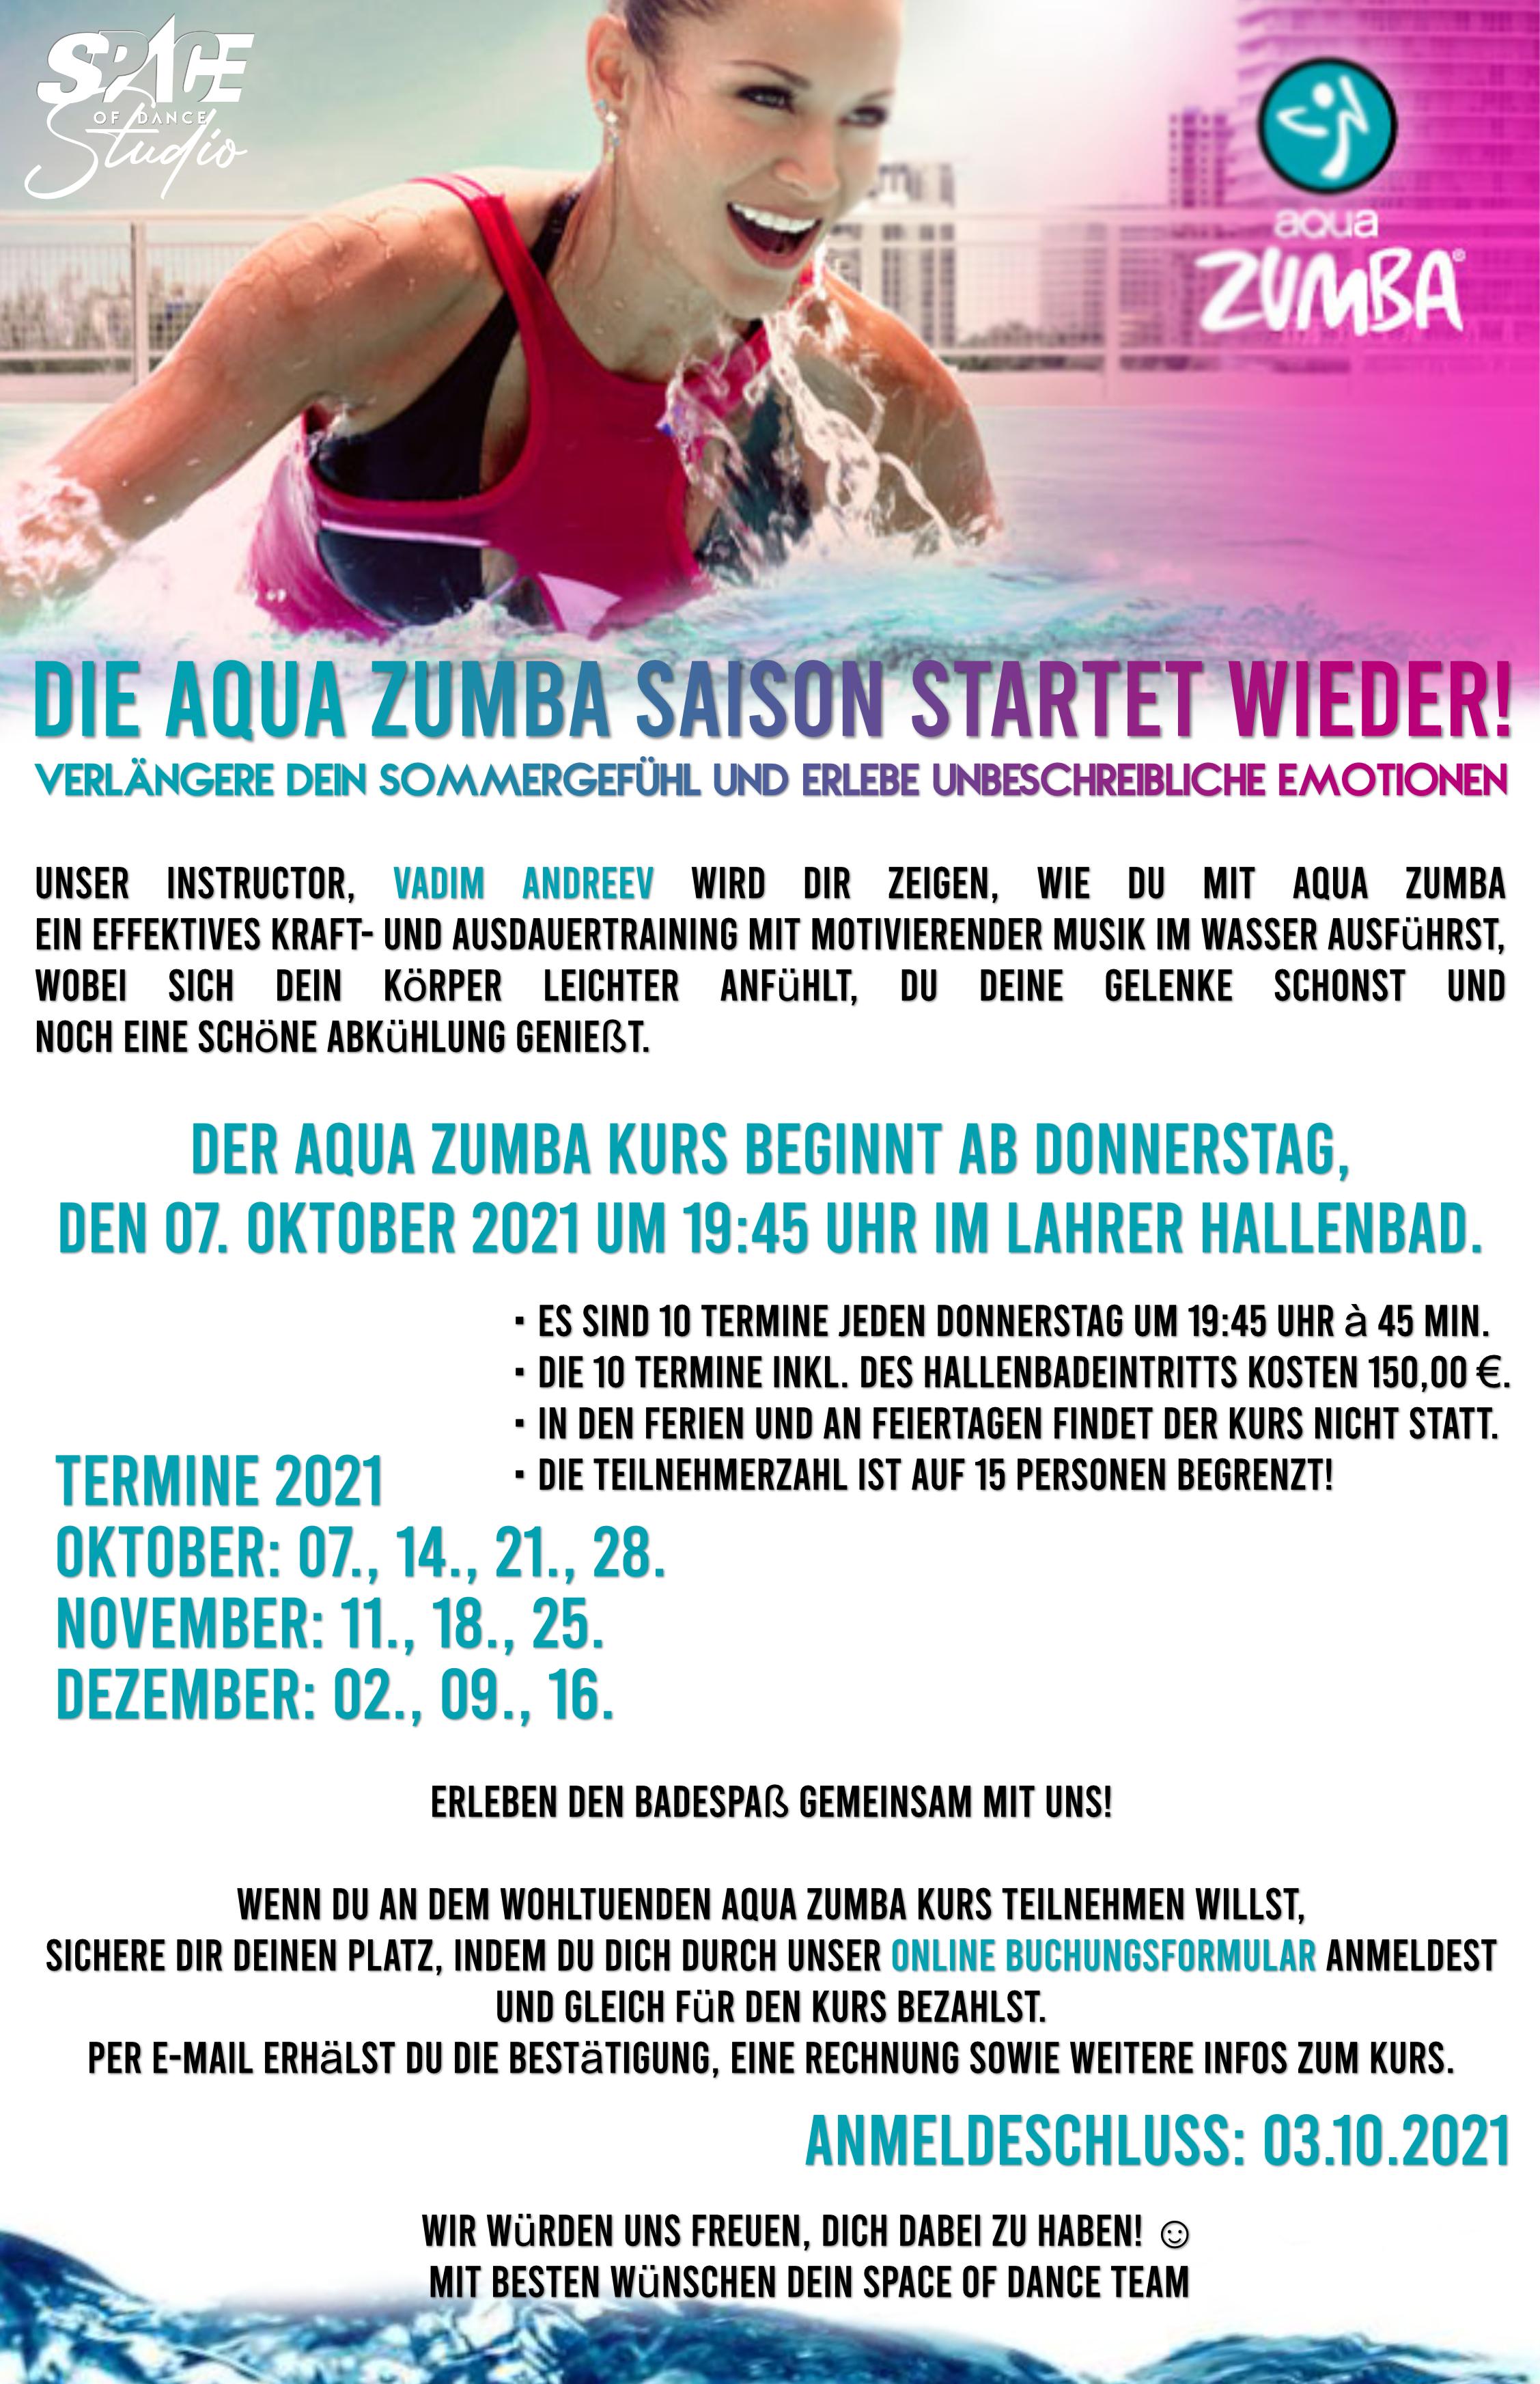 Aqua Zumba Werbung